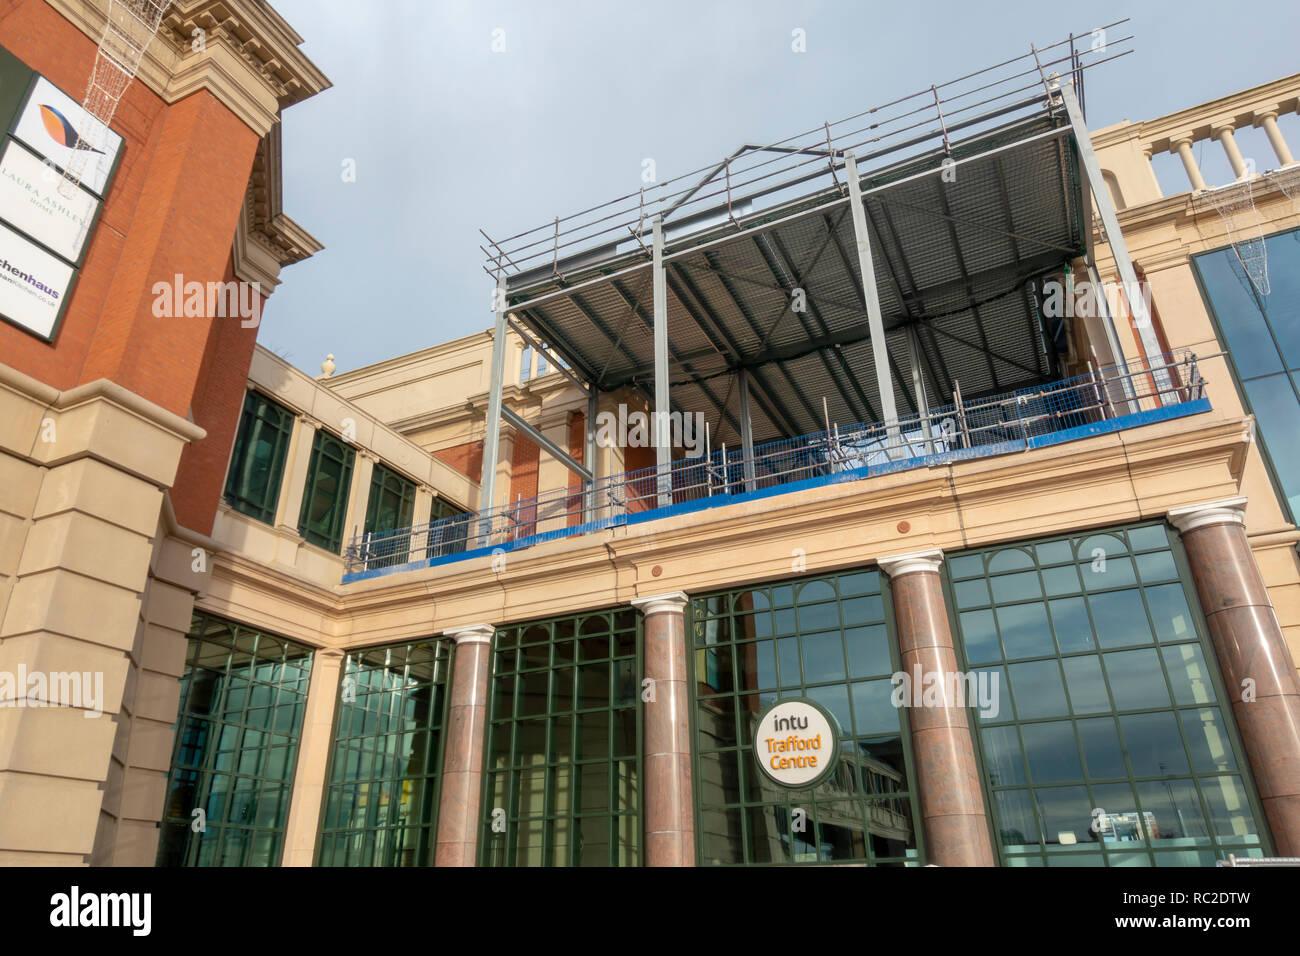 Roof Construction at Barton Square, intu Trafford Centre. - Stock Image